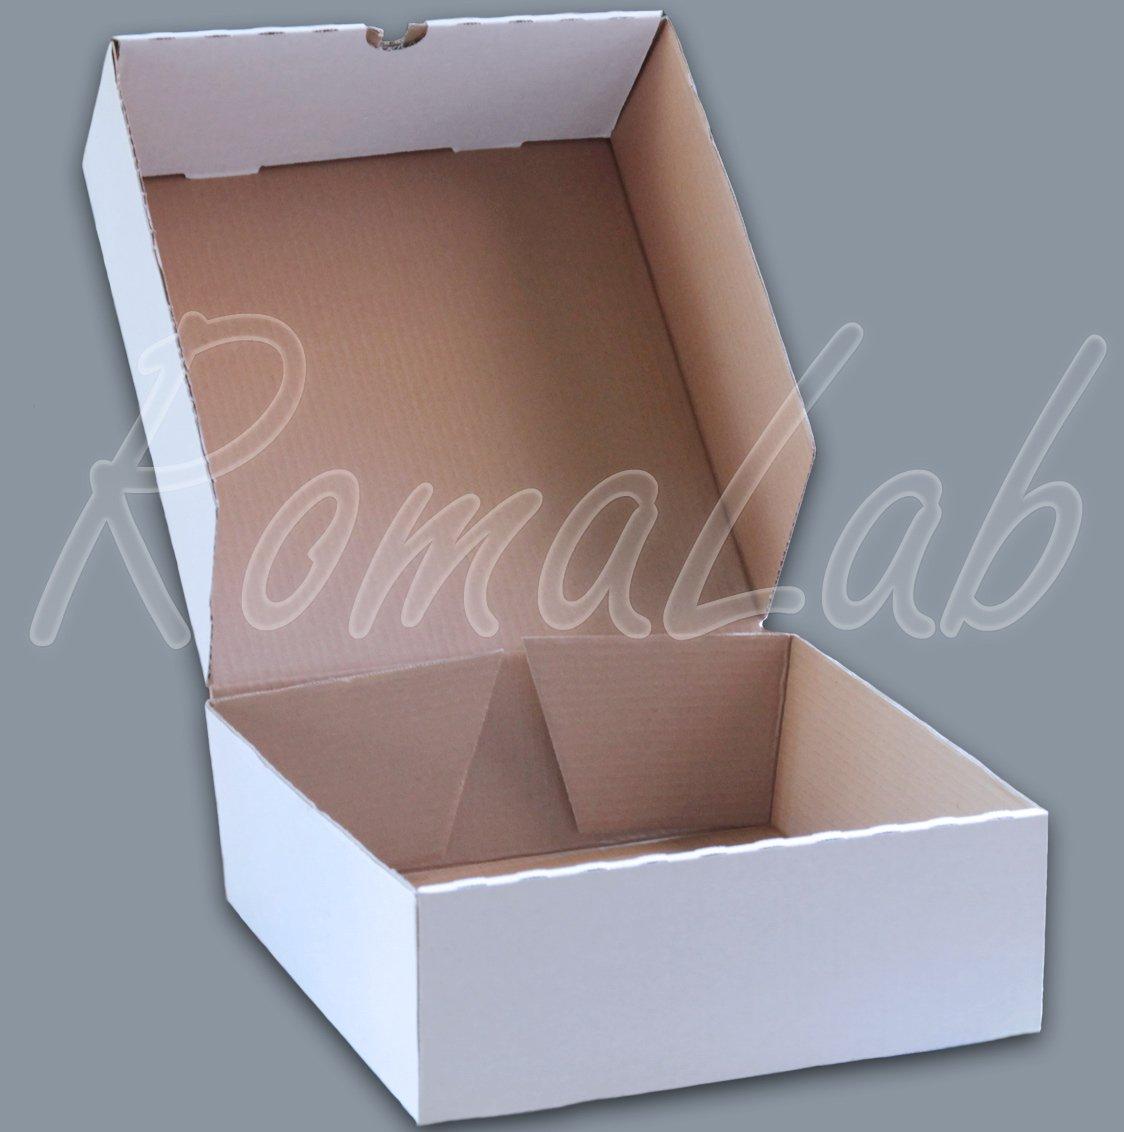 1 scatola fustellata BIANCA 34x32, 2x11 cm X torte spedizioni REGALI PASTICCERIA RomaLab.it